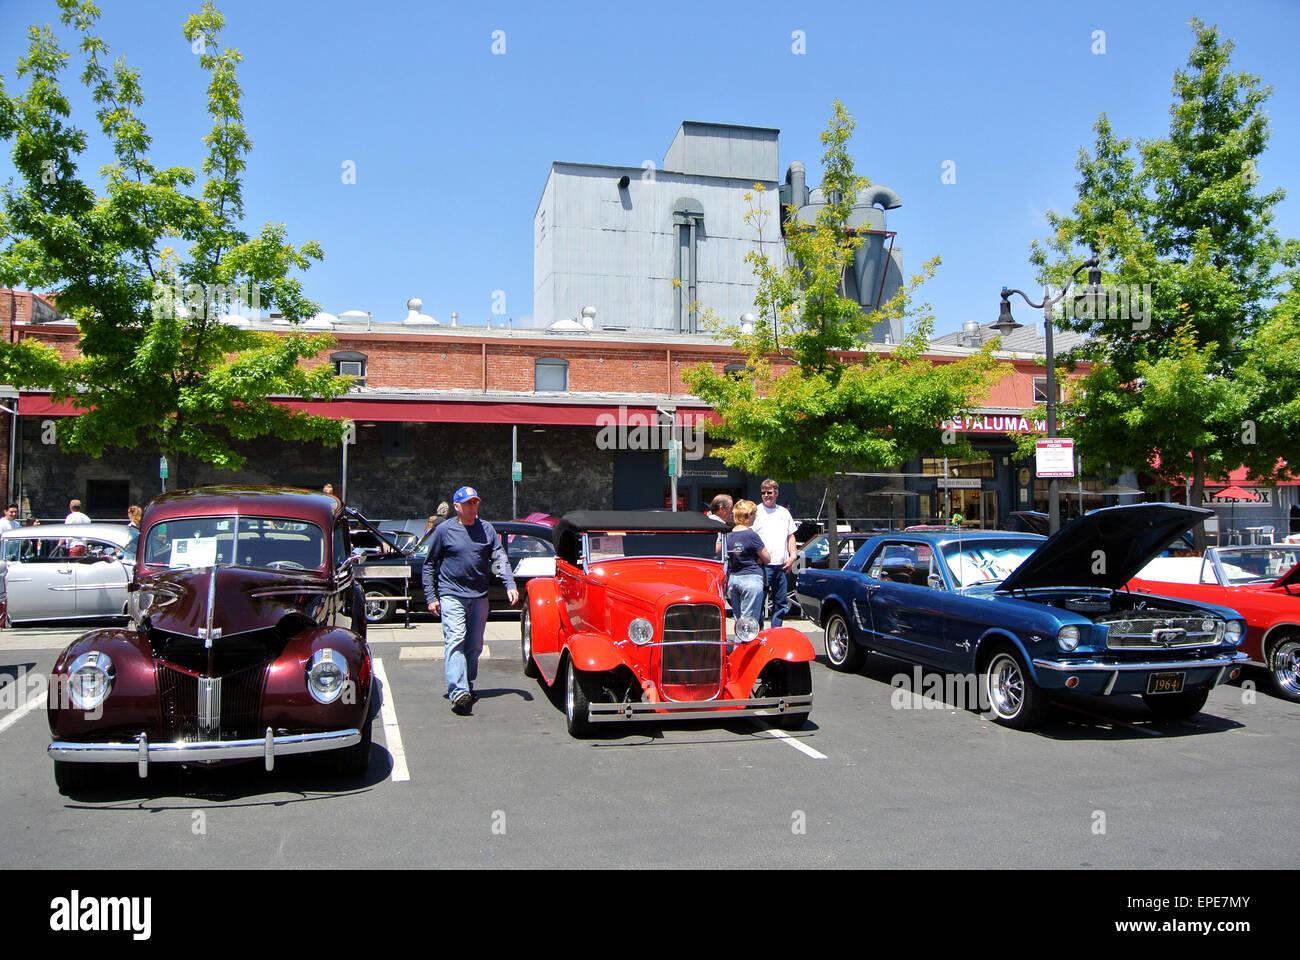 Petaluma, California, USA. 17th May, 2015. classic cars on display ...